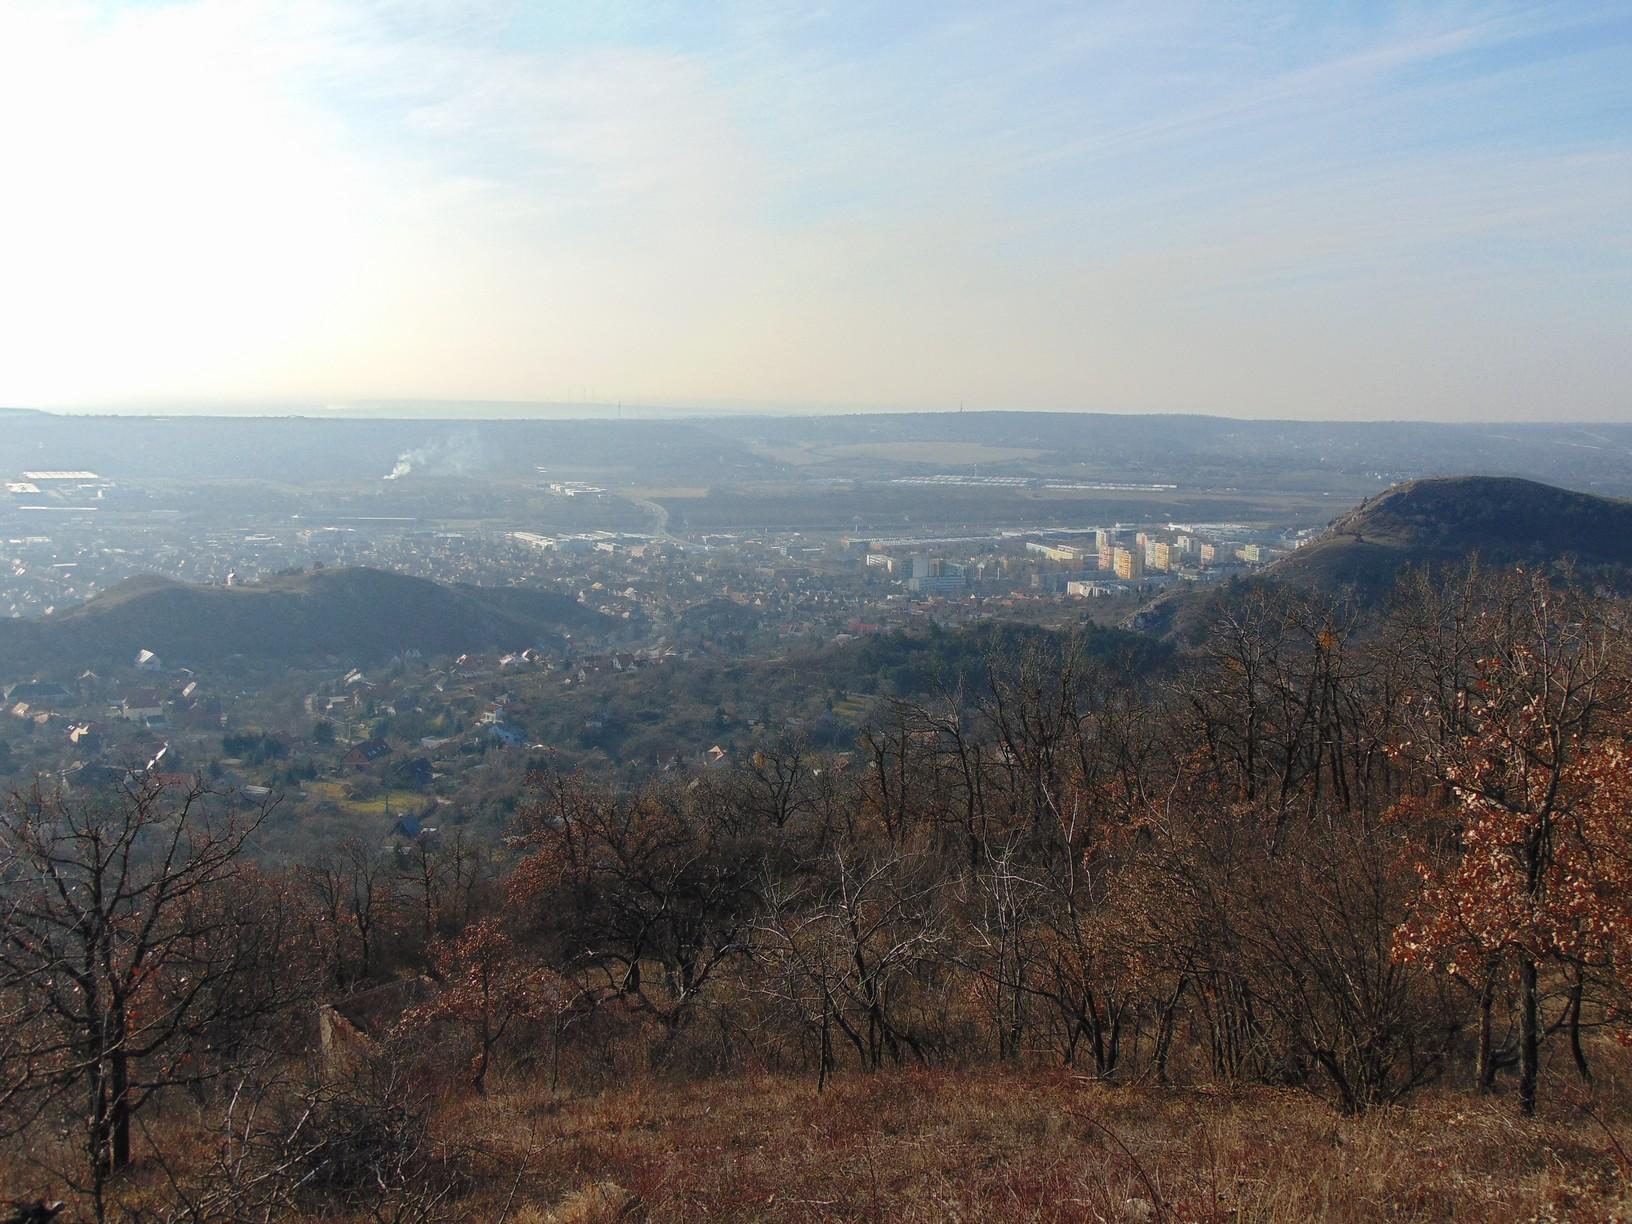 Kilátás a Magas-Frank-hegyről Budaörsre